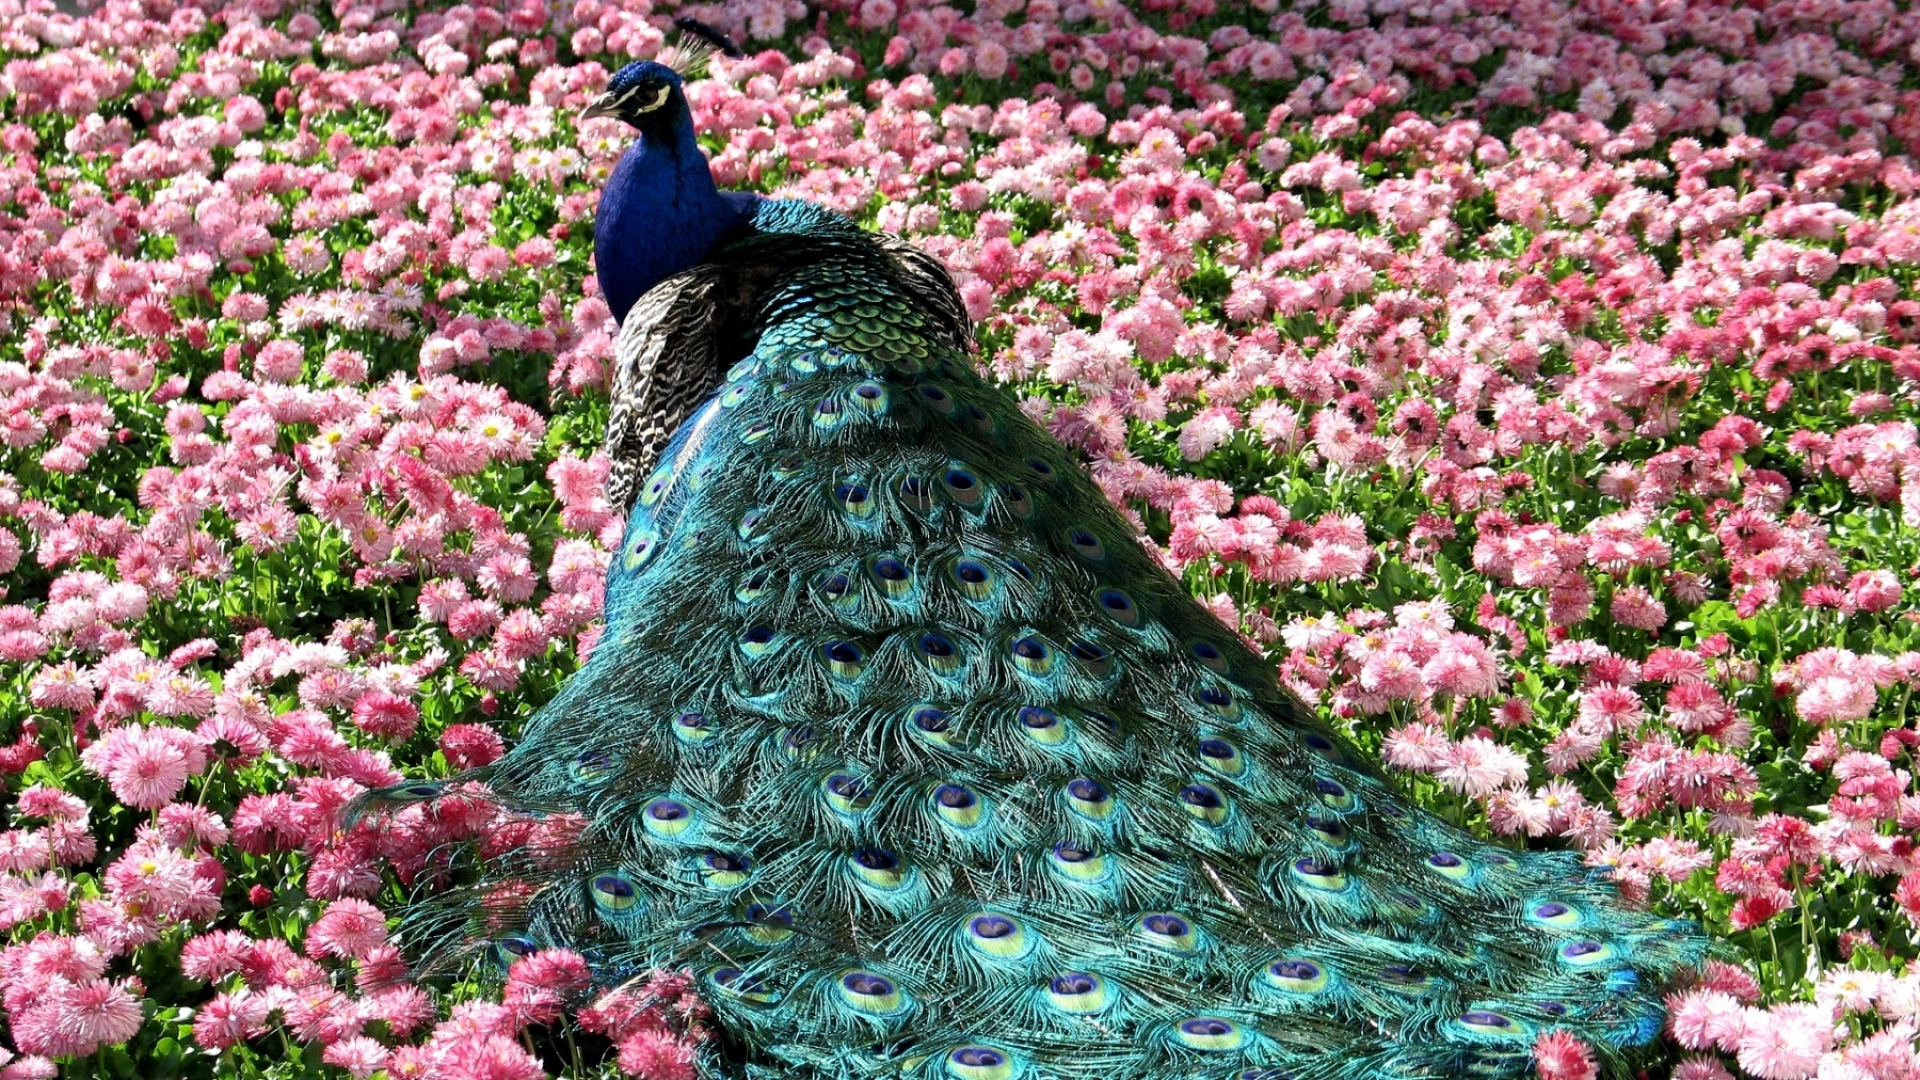 peacock bird wallpaper hd 50071